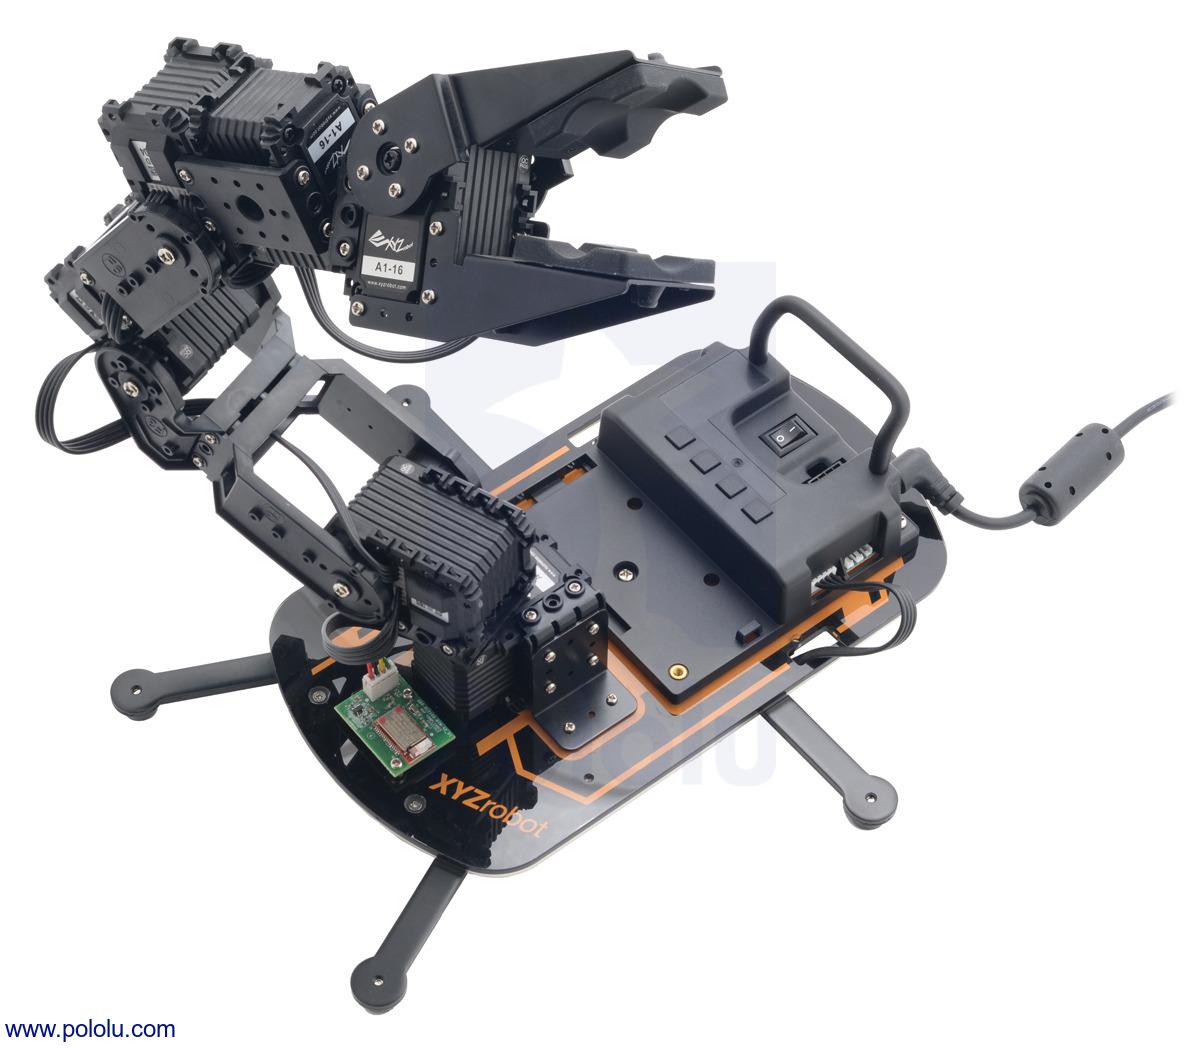 Pololu - XYZrobot Smart Servo A1-16